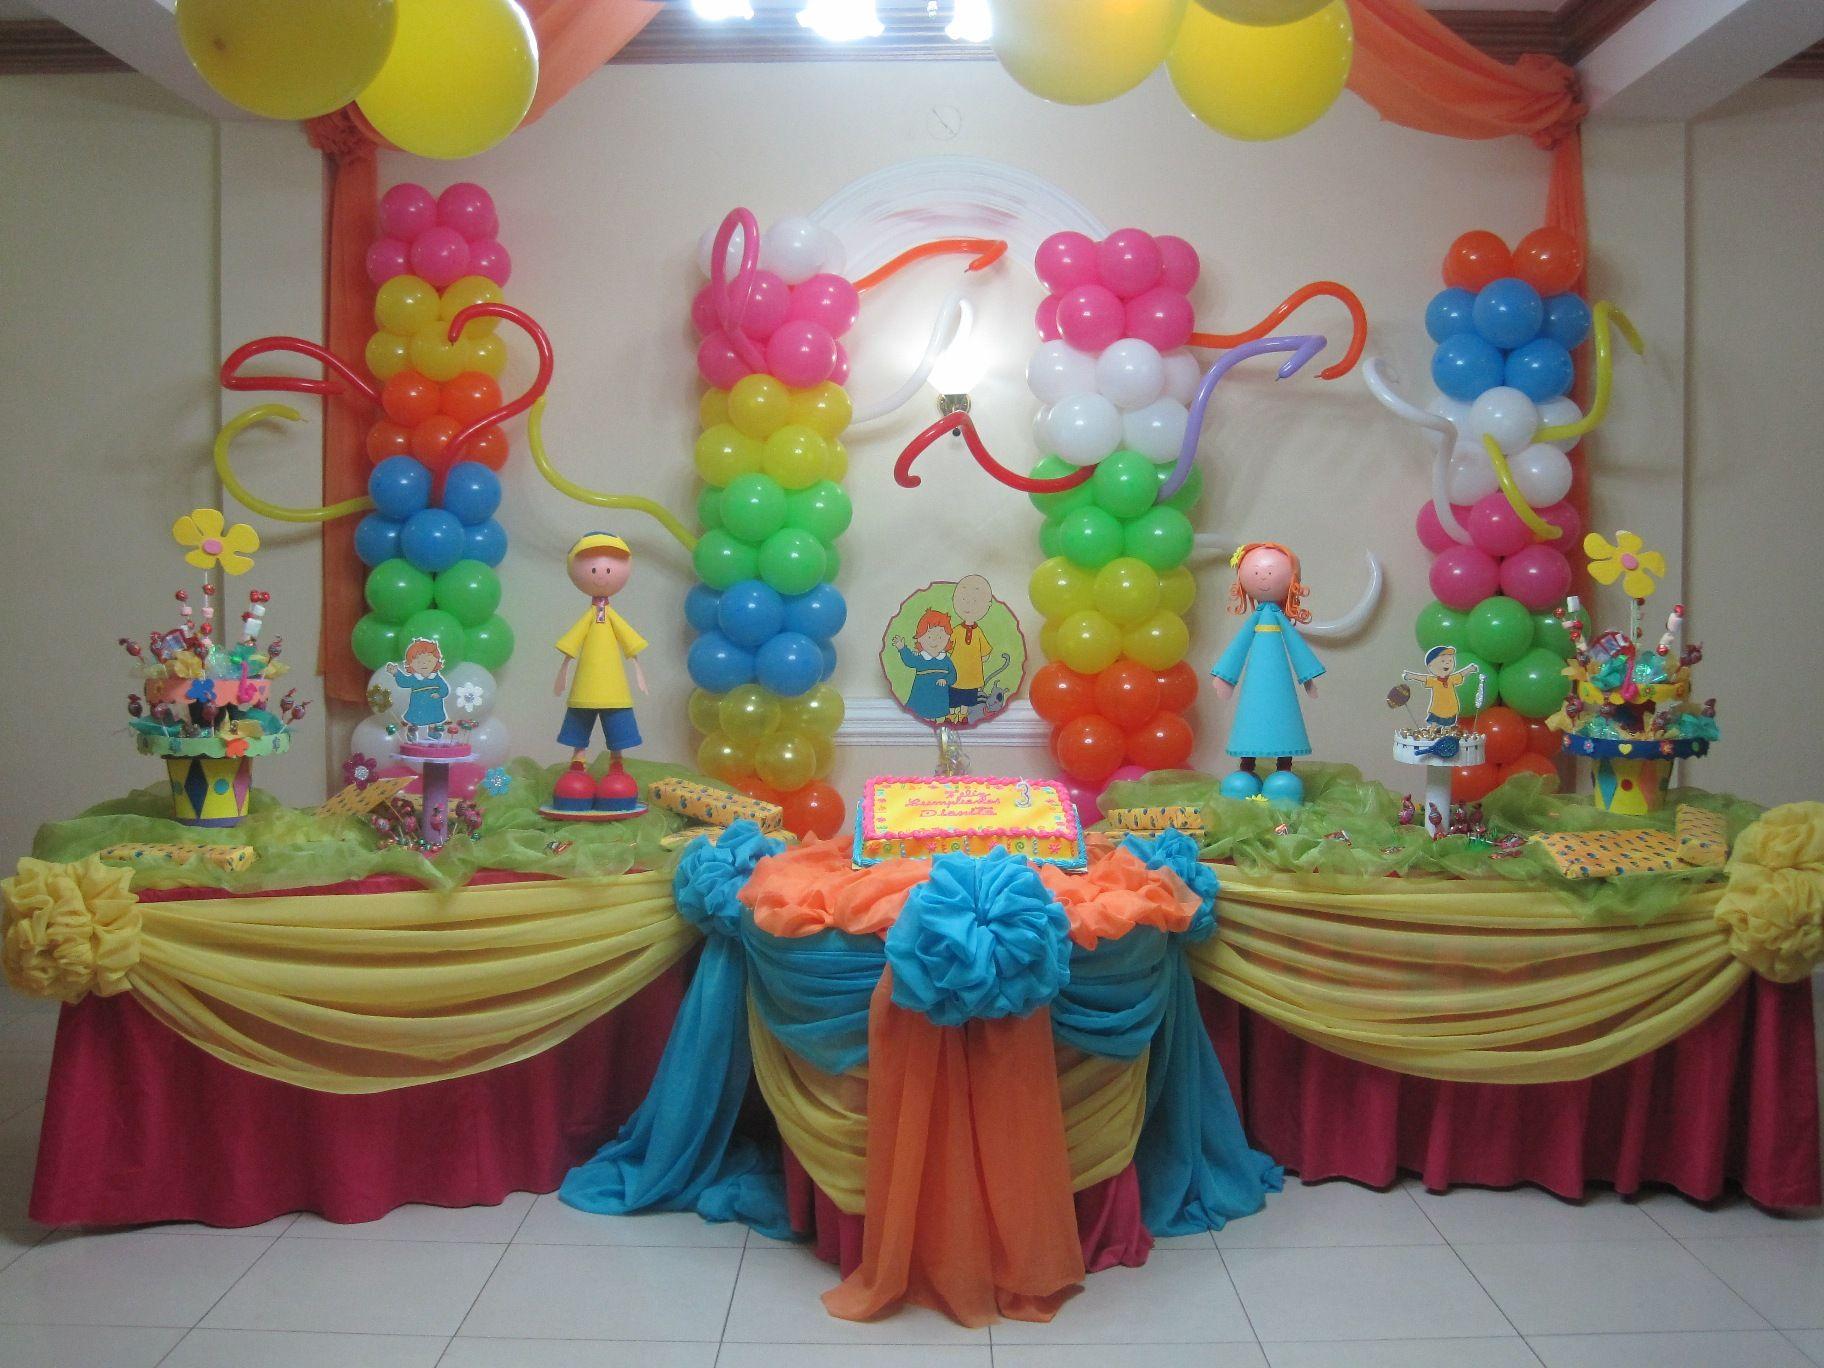 Mesa de fiesta infantil fiestas centros de mesa dulces for Mesas fiestas infantiles